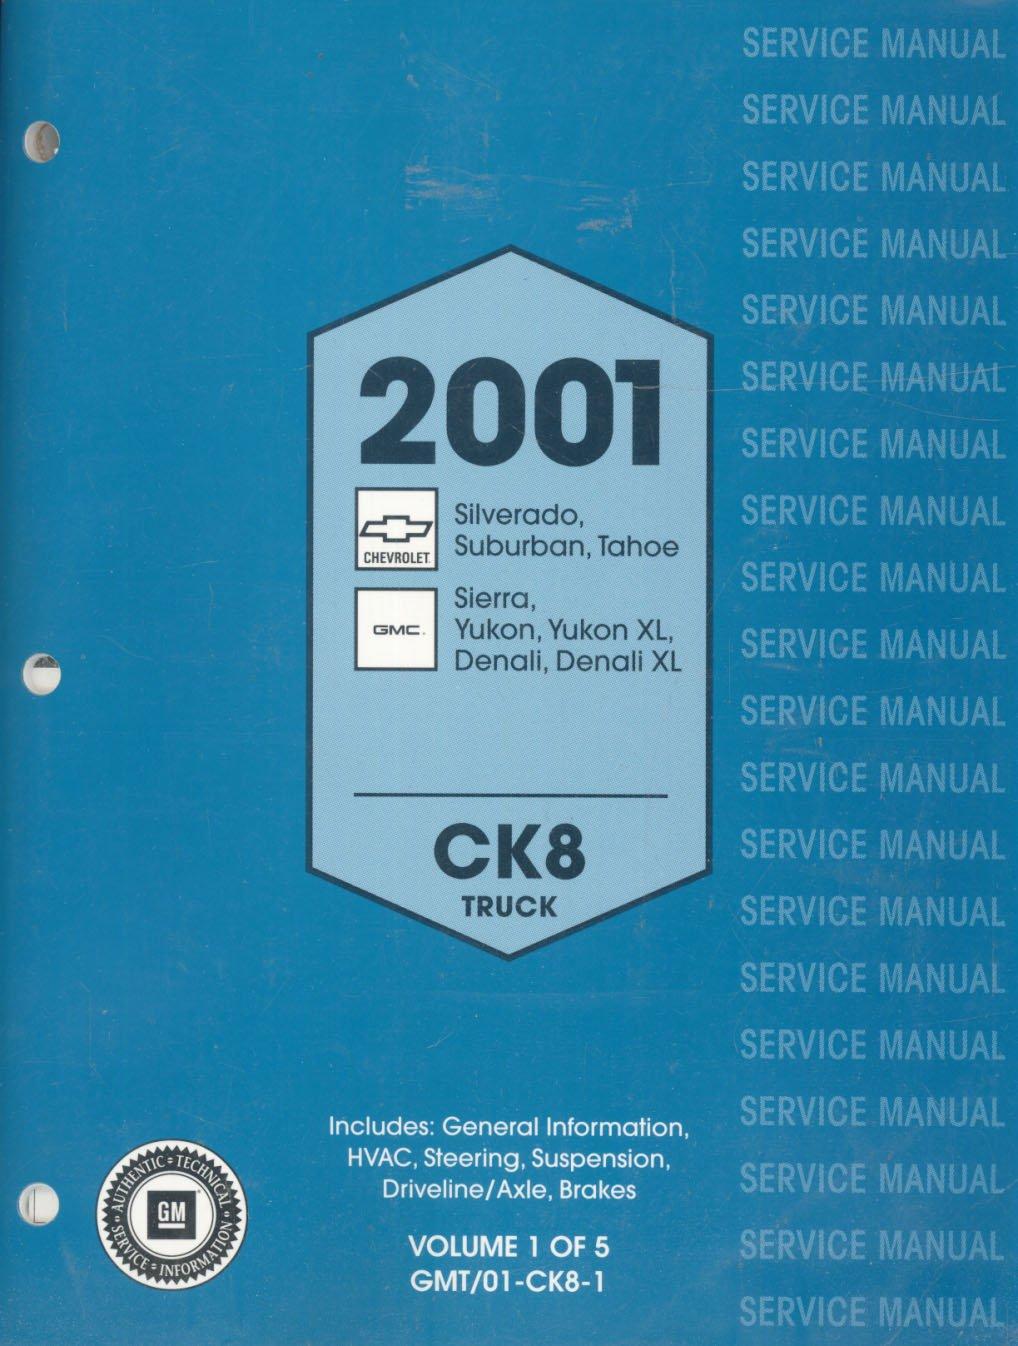 GM 2001 Service Manual CK8 Truck: Chevrolet Silverado, Tahoe, Suburban and GMC  Sierra, Yukon, Yukon XL, Denali, Denali XL Truck Service Information  (Volumes ...